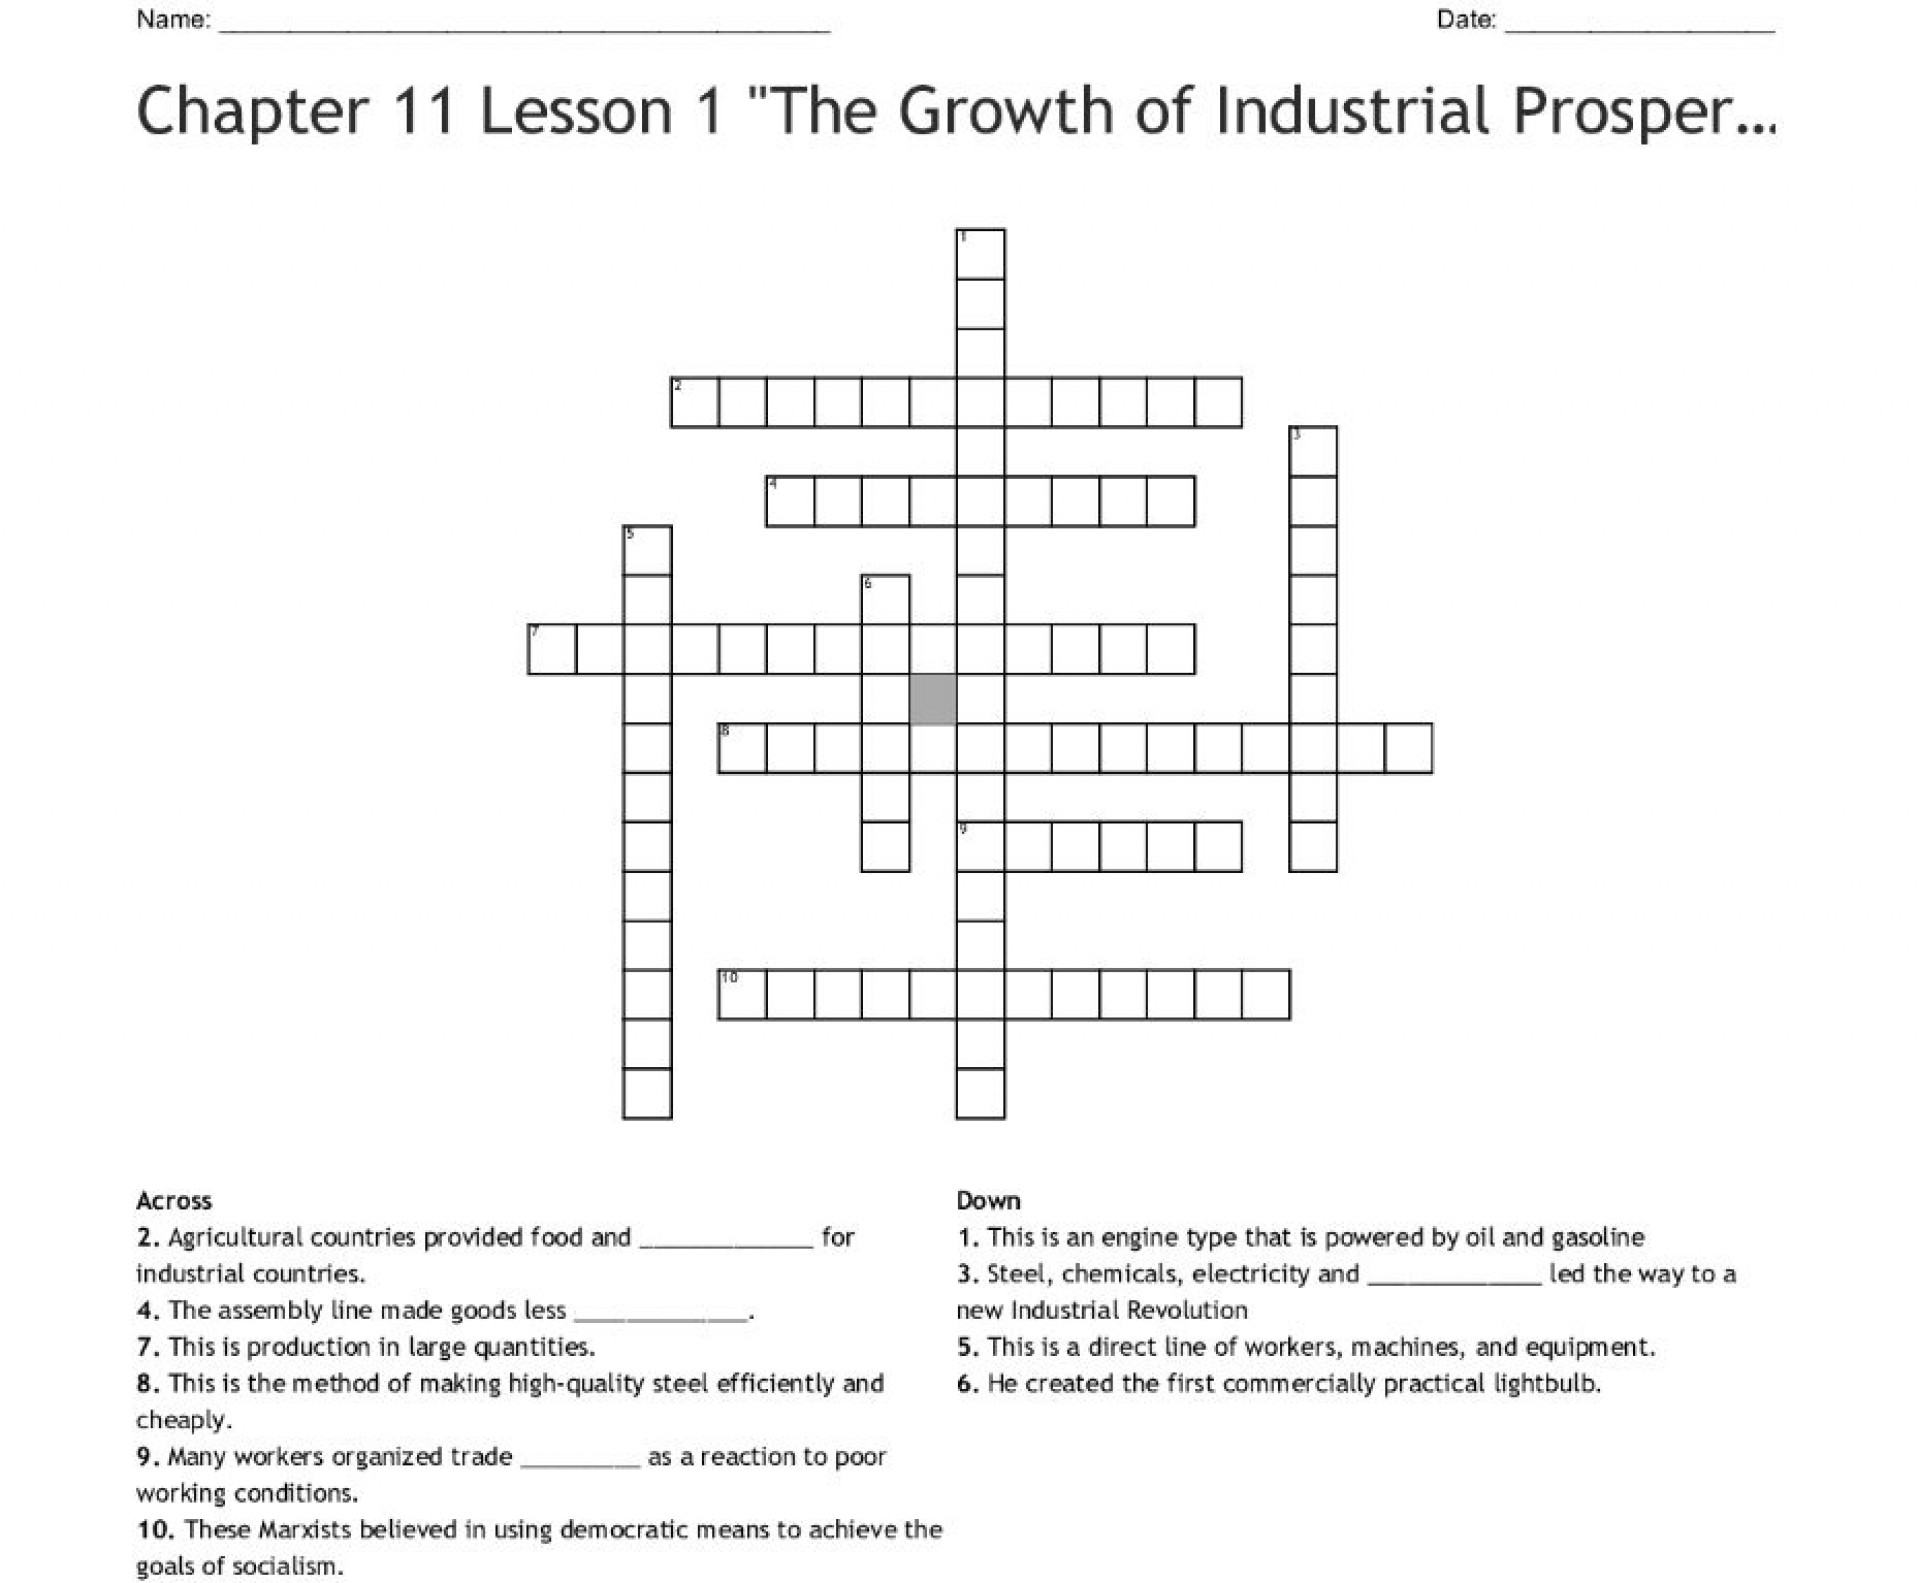 000 Unbelievable Prosperity Crossword Design  Sound Clue Material1920